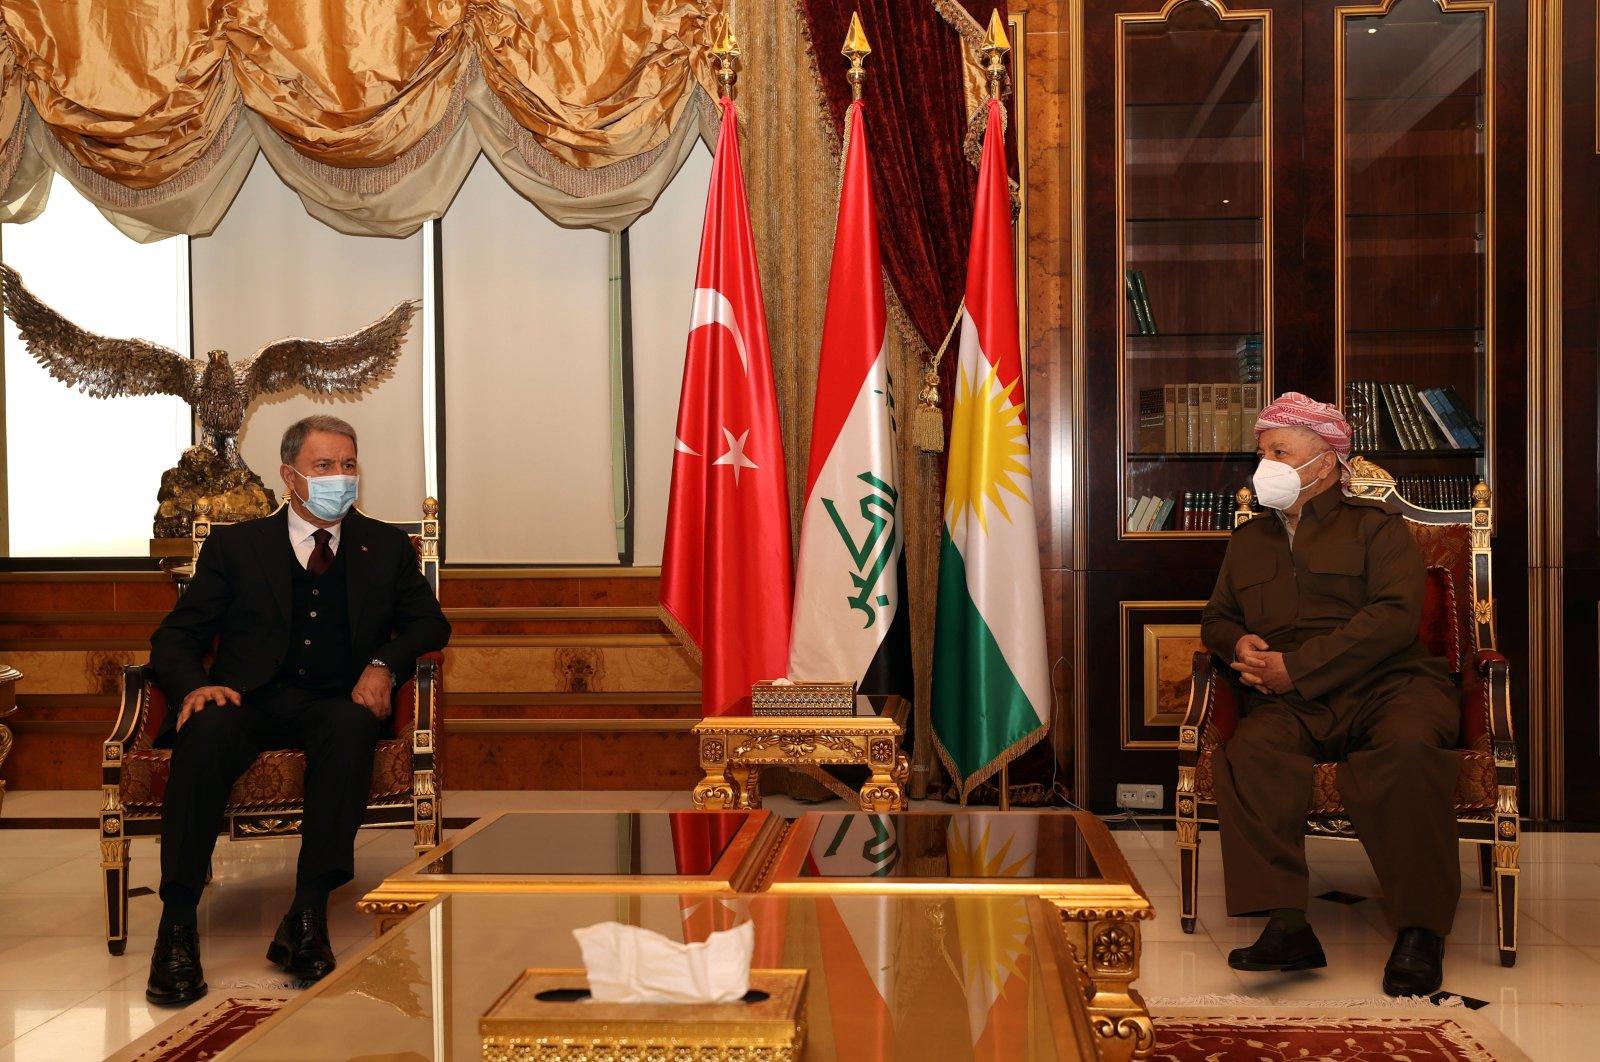 Defense Minister Hulusi Akar (L) and former Kurdish Regional Government (KRG) President Masoud Barzani hold a meeting in the KRG capital Irbil, Jan. 19, 2020. (AA Photo)